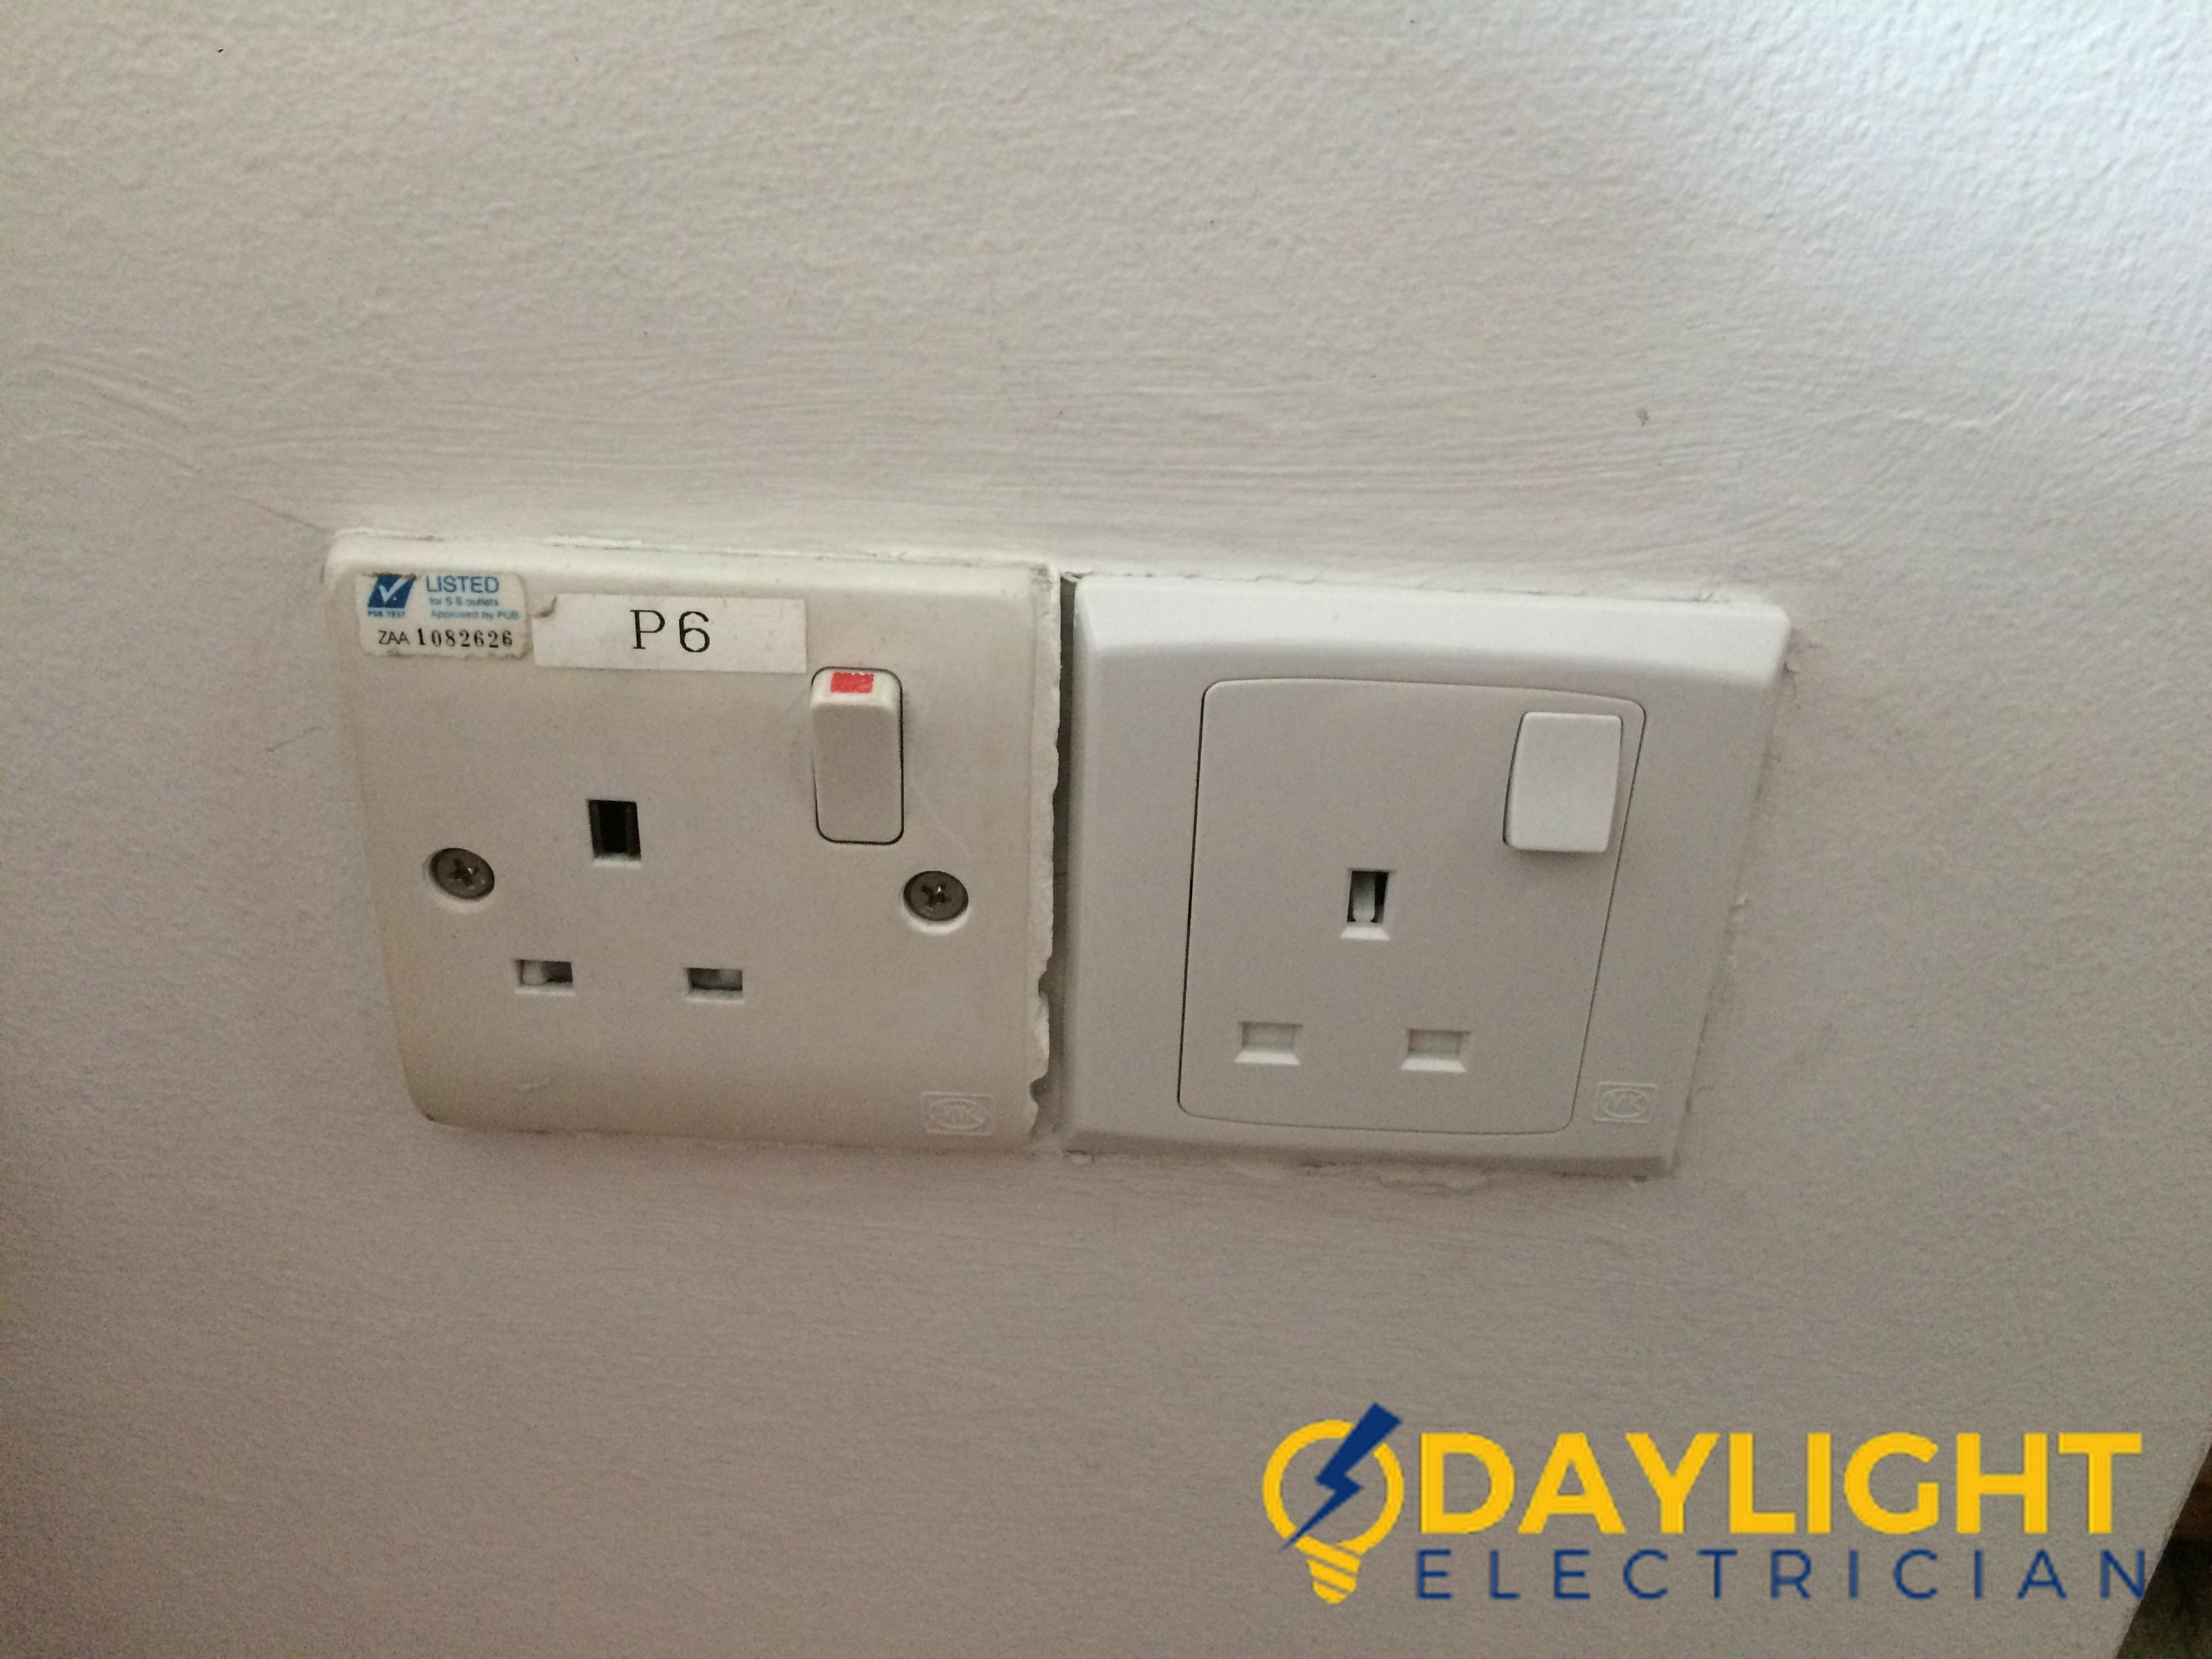 wall-socket-installation-daylight-electrician-singapore-condo-jurong-east_wm